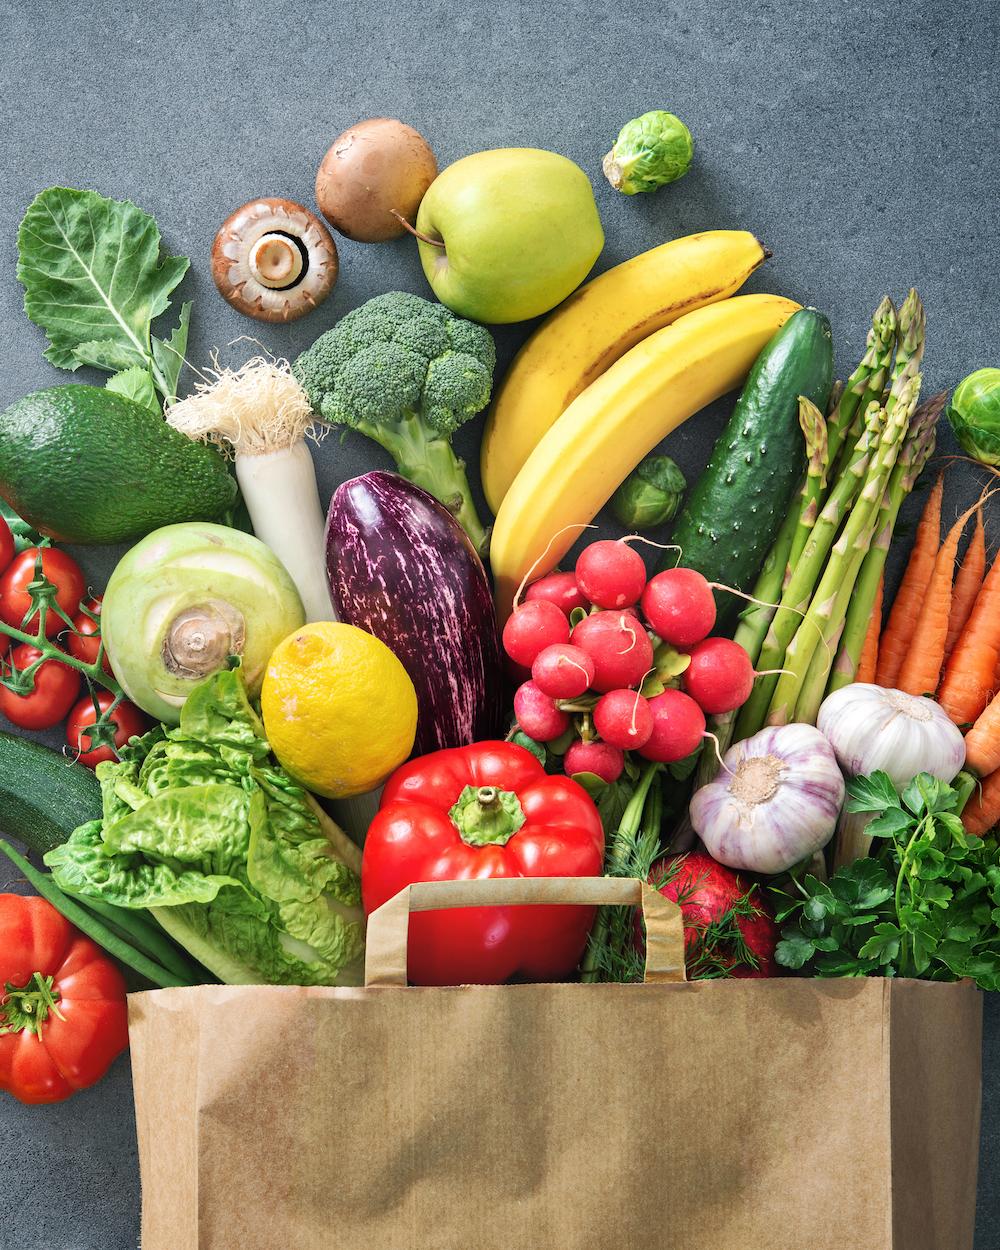 Fruits   Veggies - More Matters